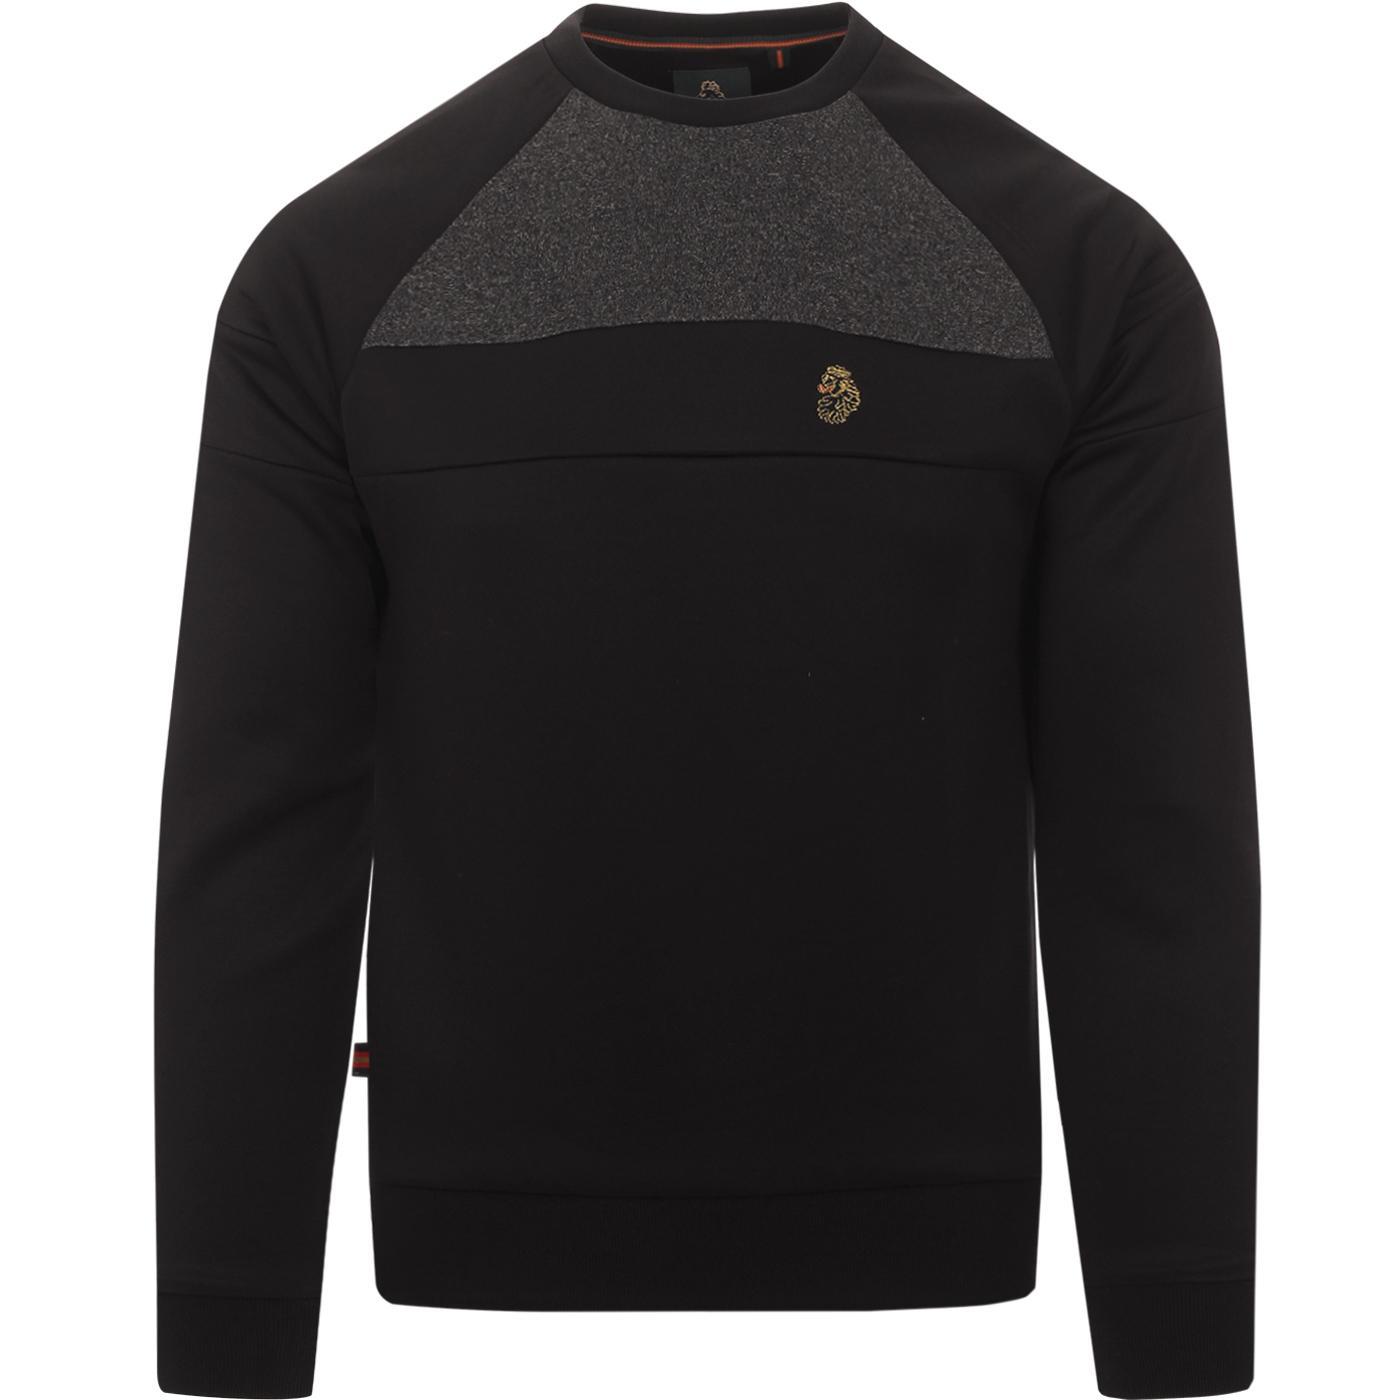 Adam 3 LUKE Retro Colour Block Tricot Sweatshirt B